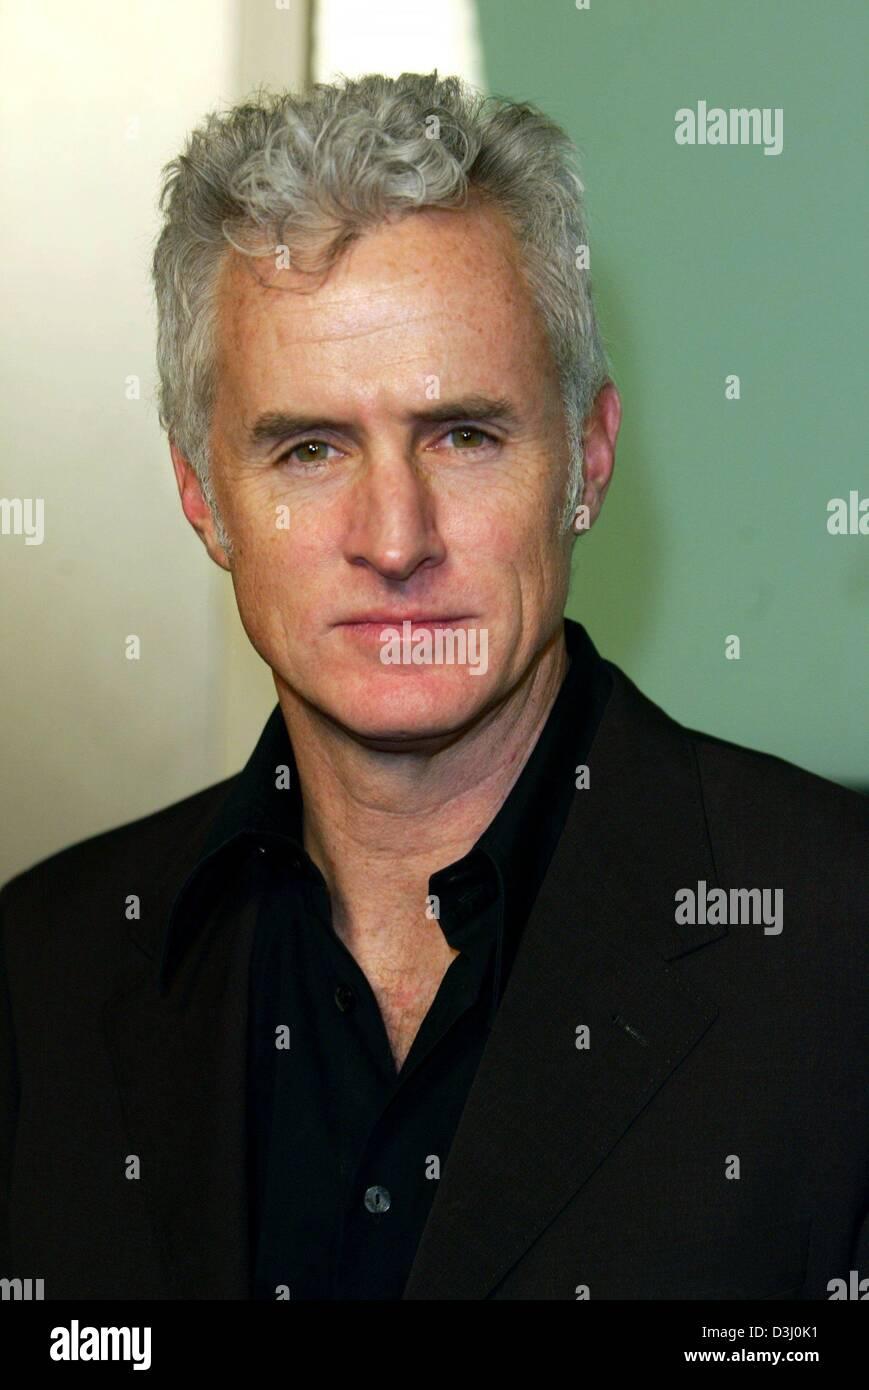 American actor John Slattery 80